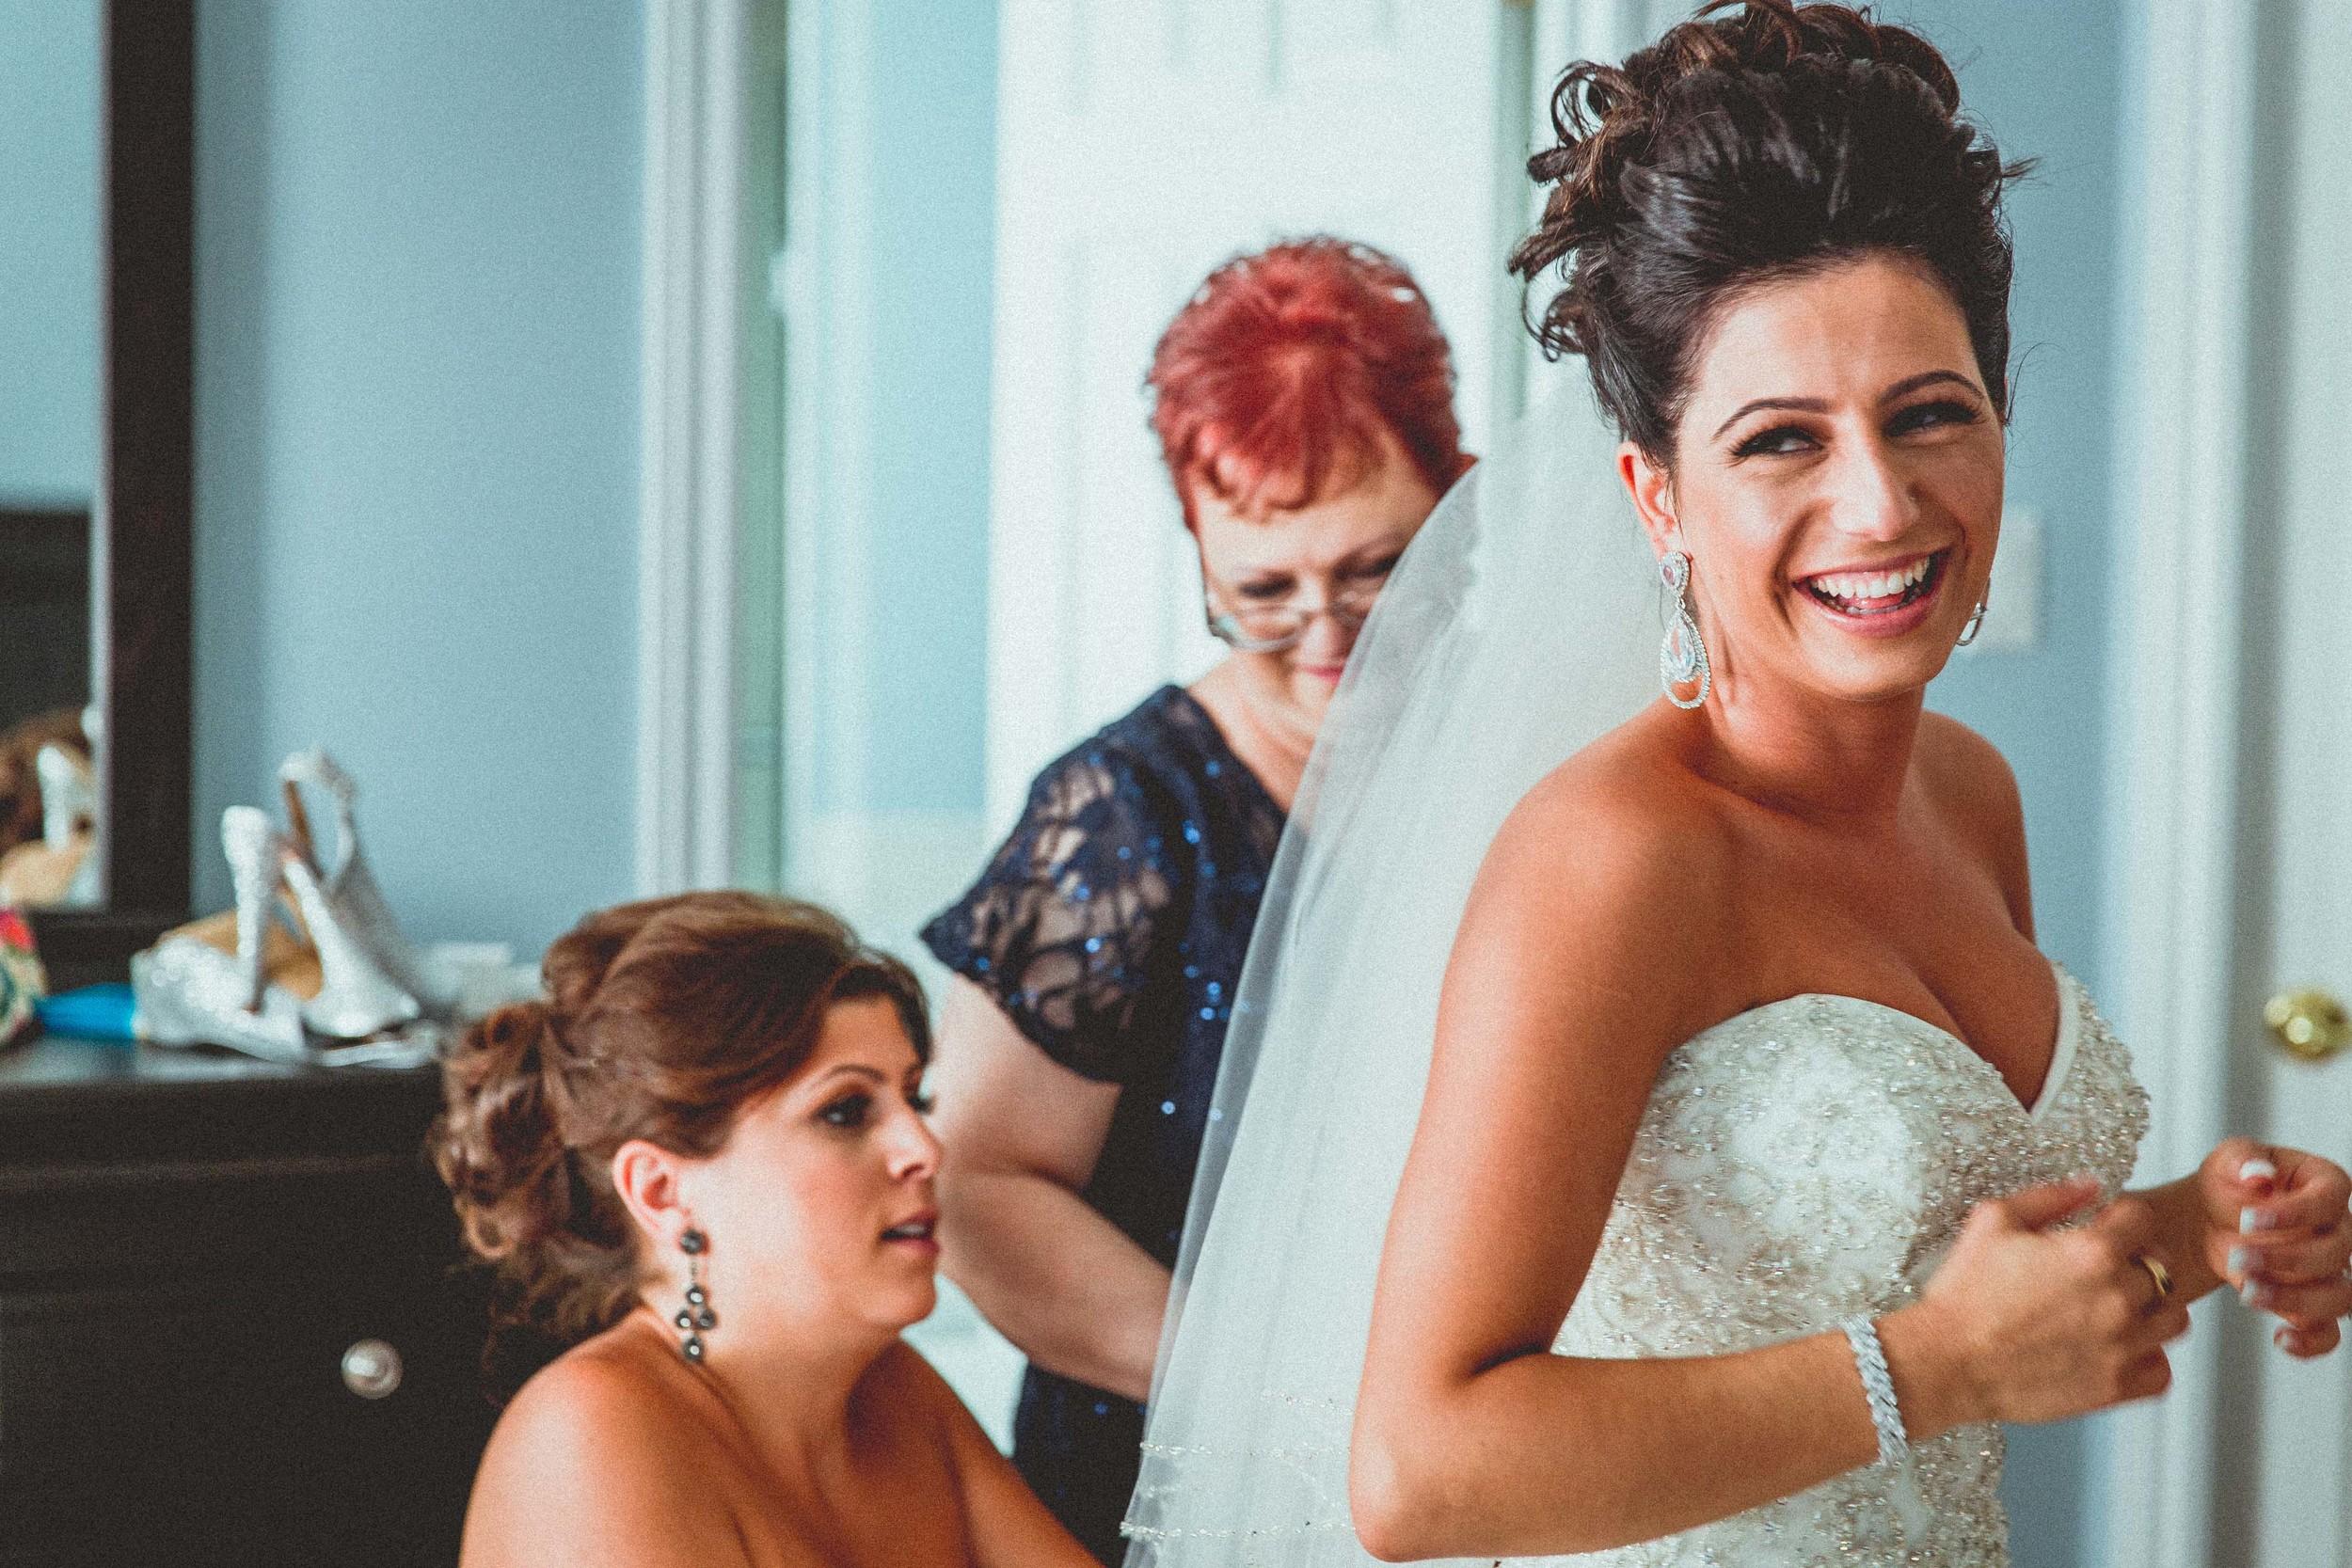 Toronto Wedding Photography | Caterina & Elvis, Pickering catholic wedding (19 of 39).jpg